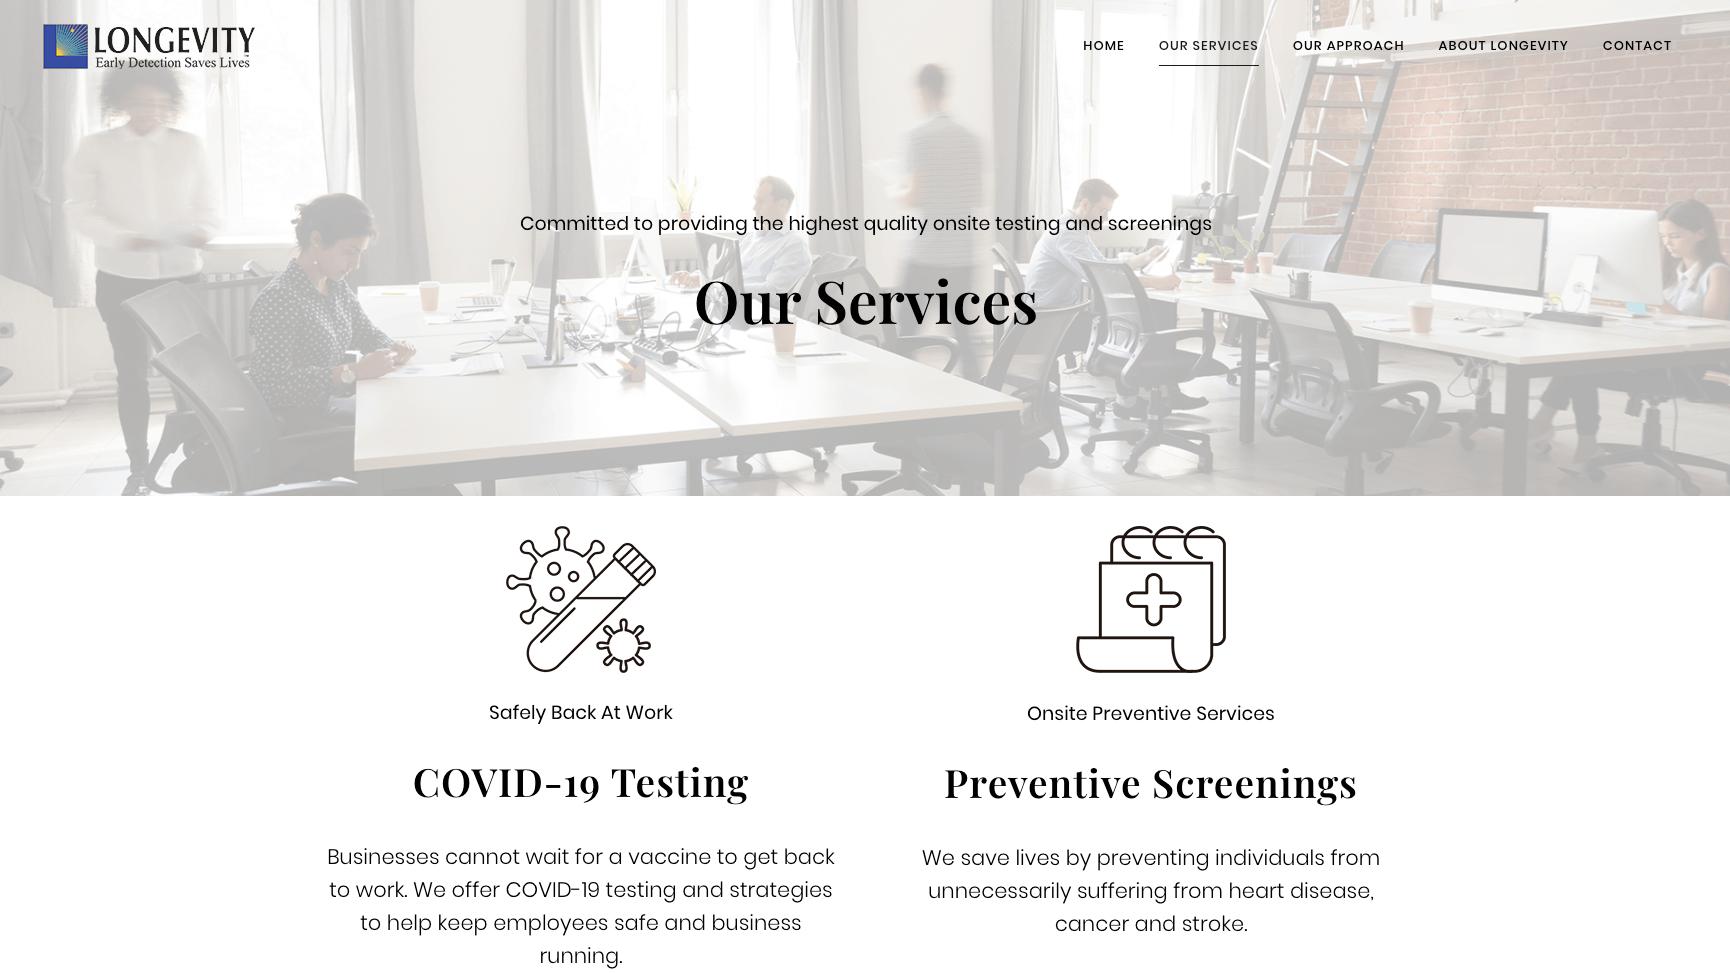 longevityllc_services.png